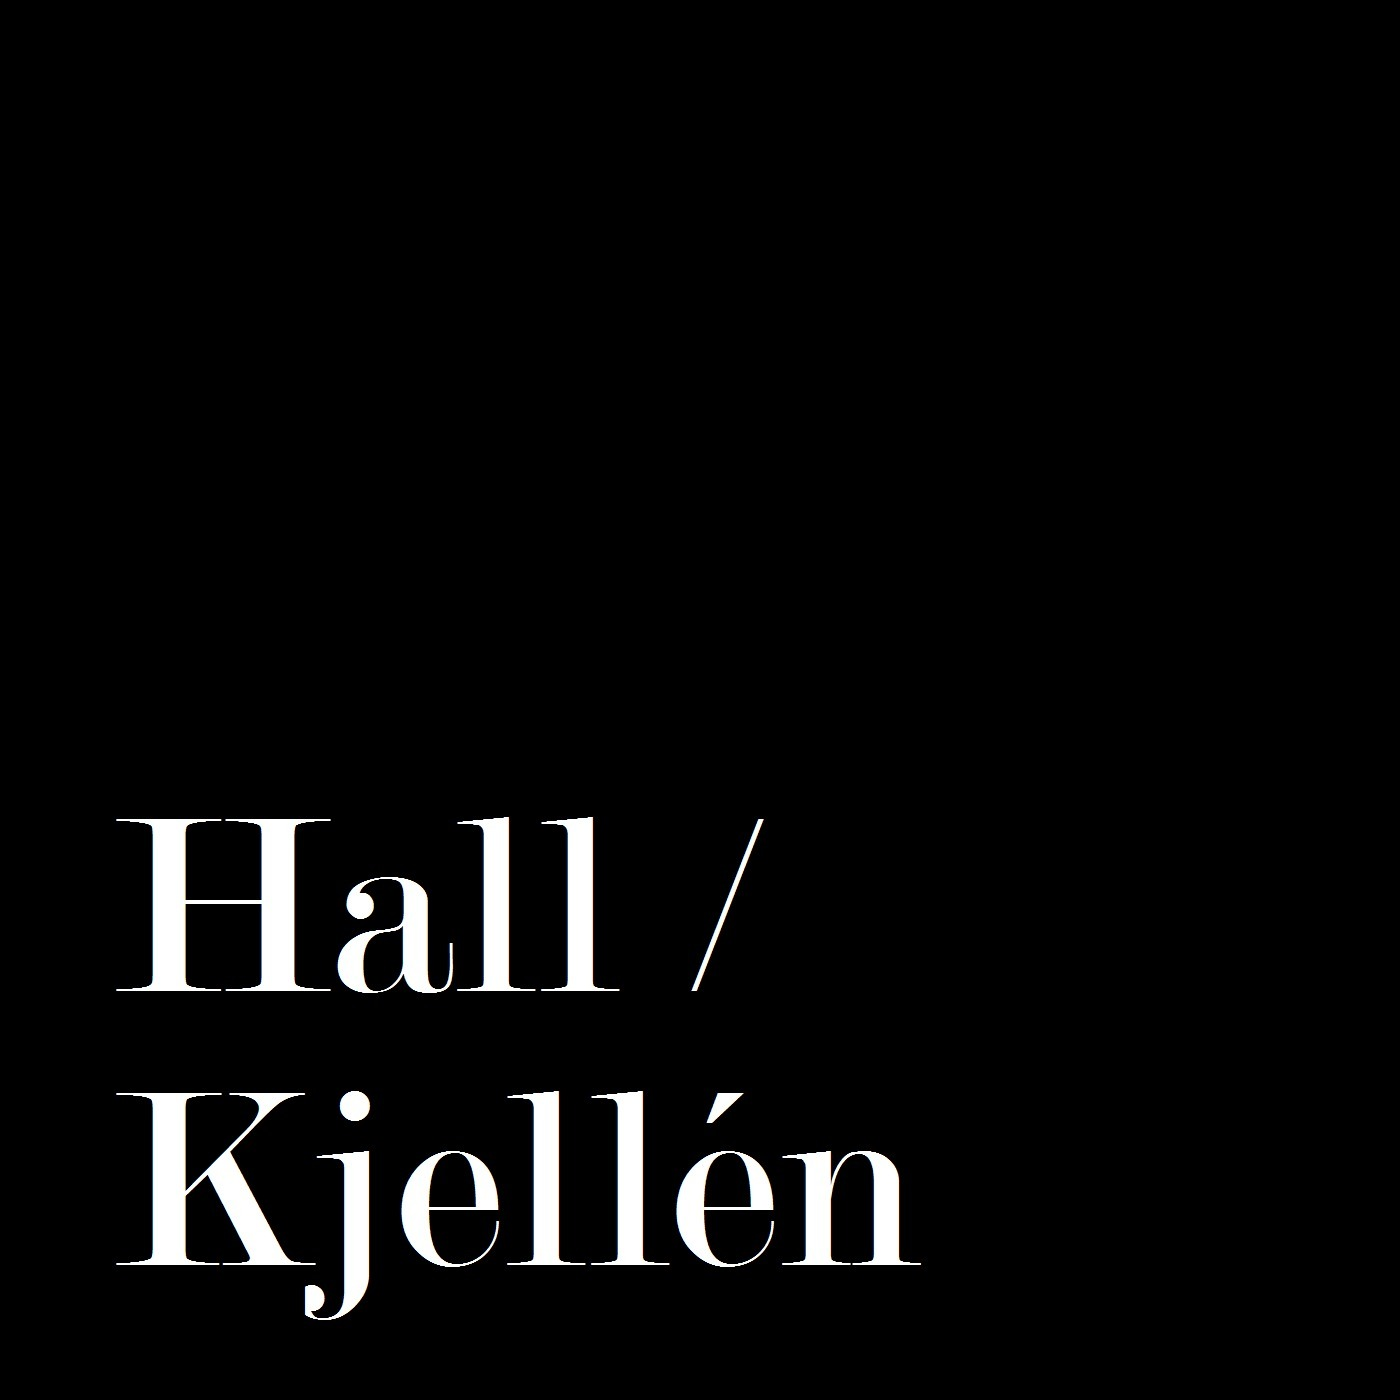 Hall / Kjellén